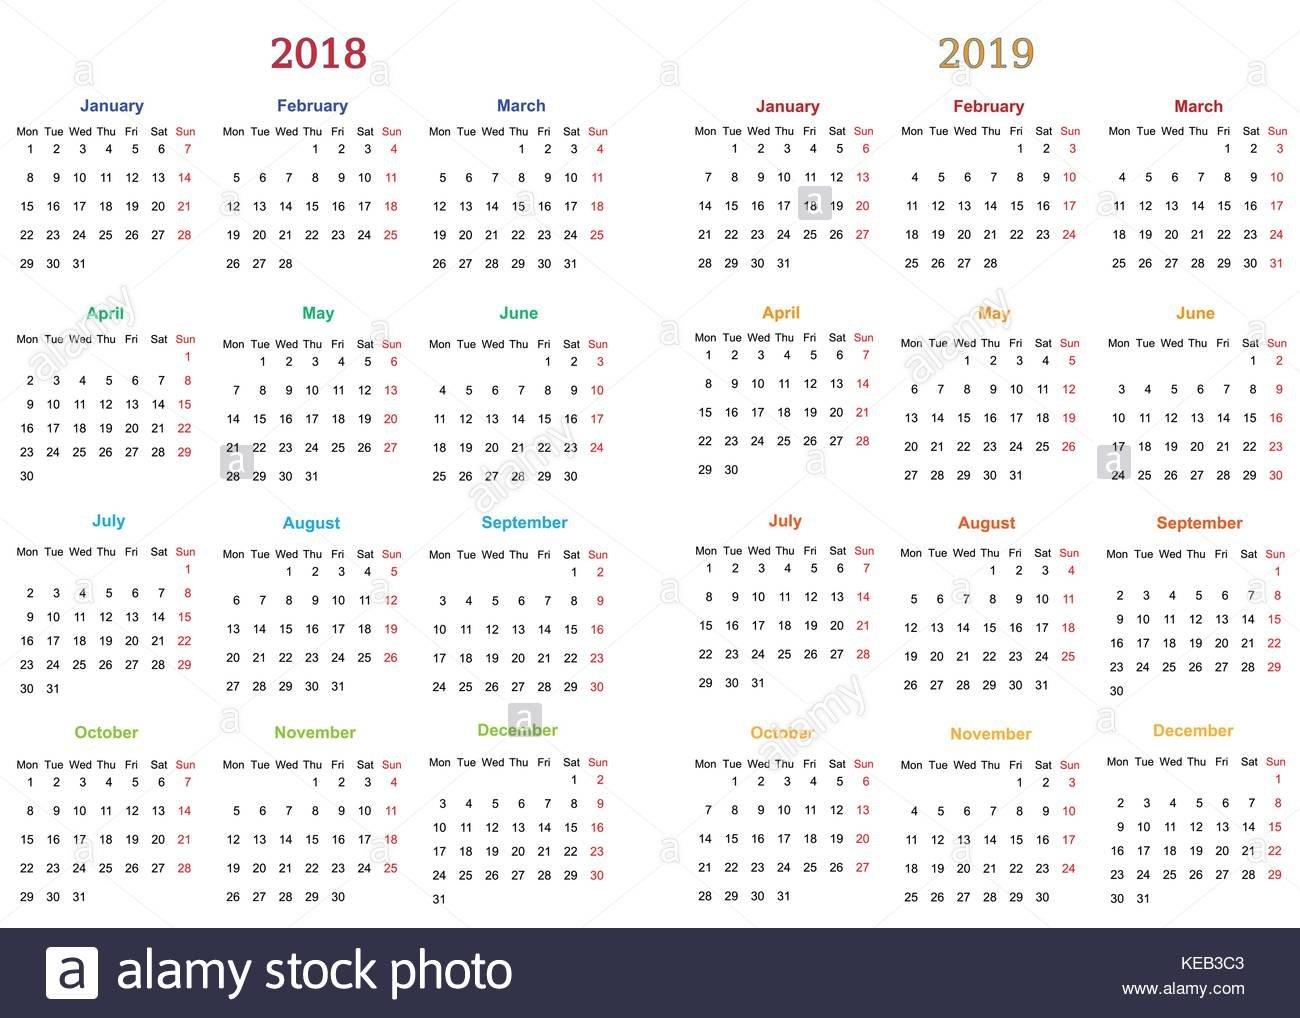 12 Months Calendar Design 2018-2019 Printable And Editable Editable 12 Month Calendar